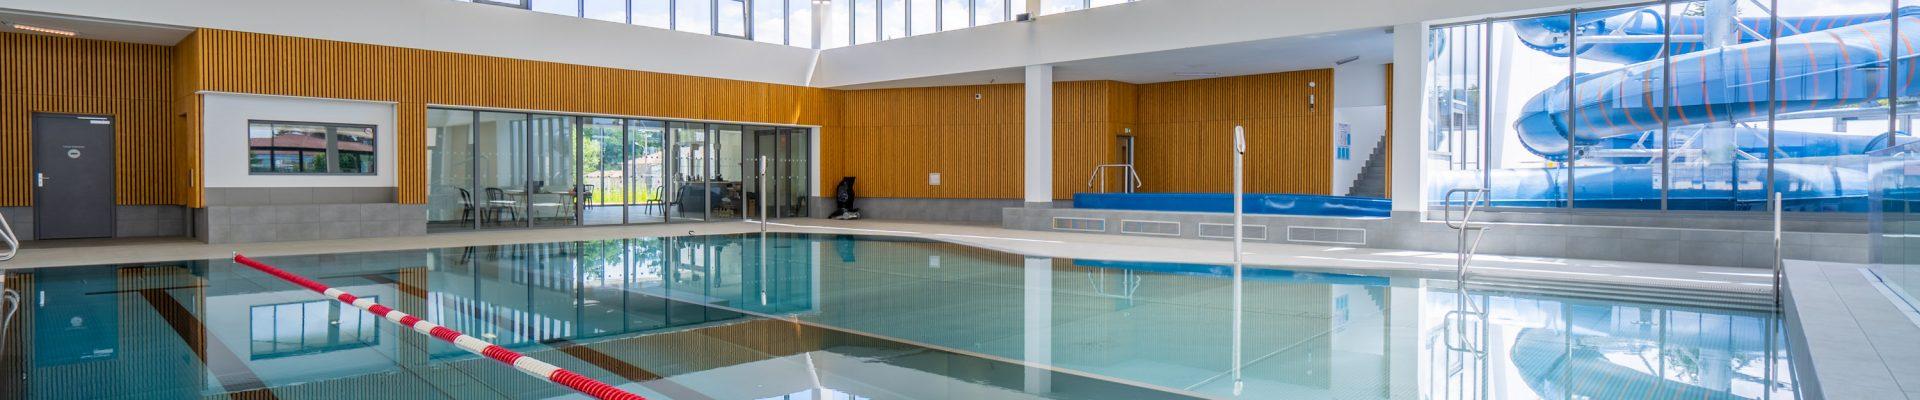 Centre aquatique intercommunal : tarifs